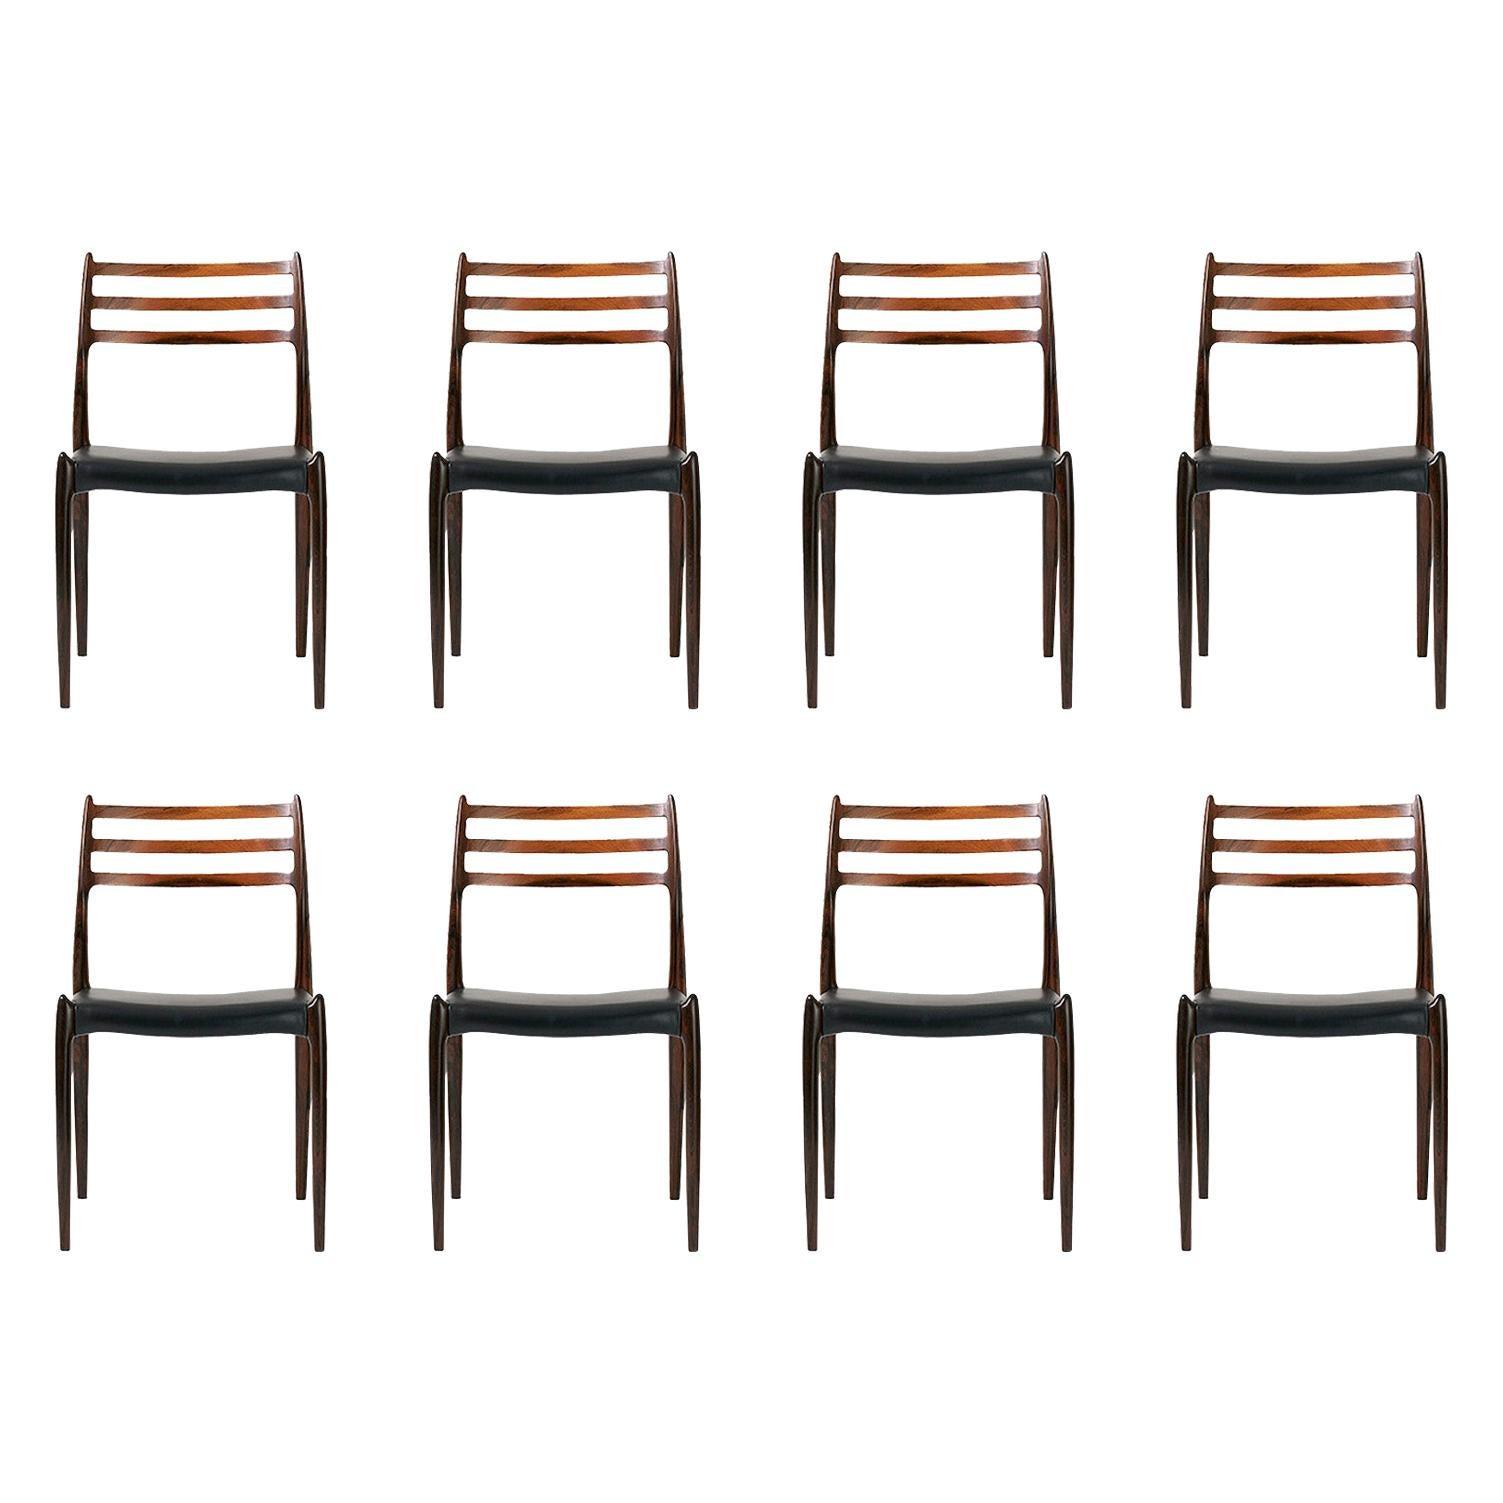 Set of 8 Niels Møller Model 78 Rosewood Dining Chairs, 1962